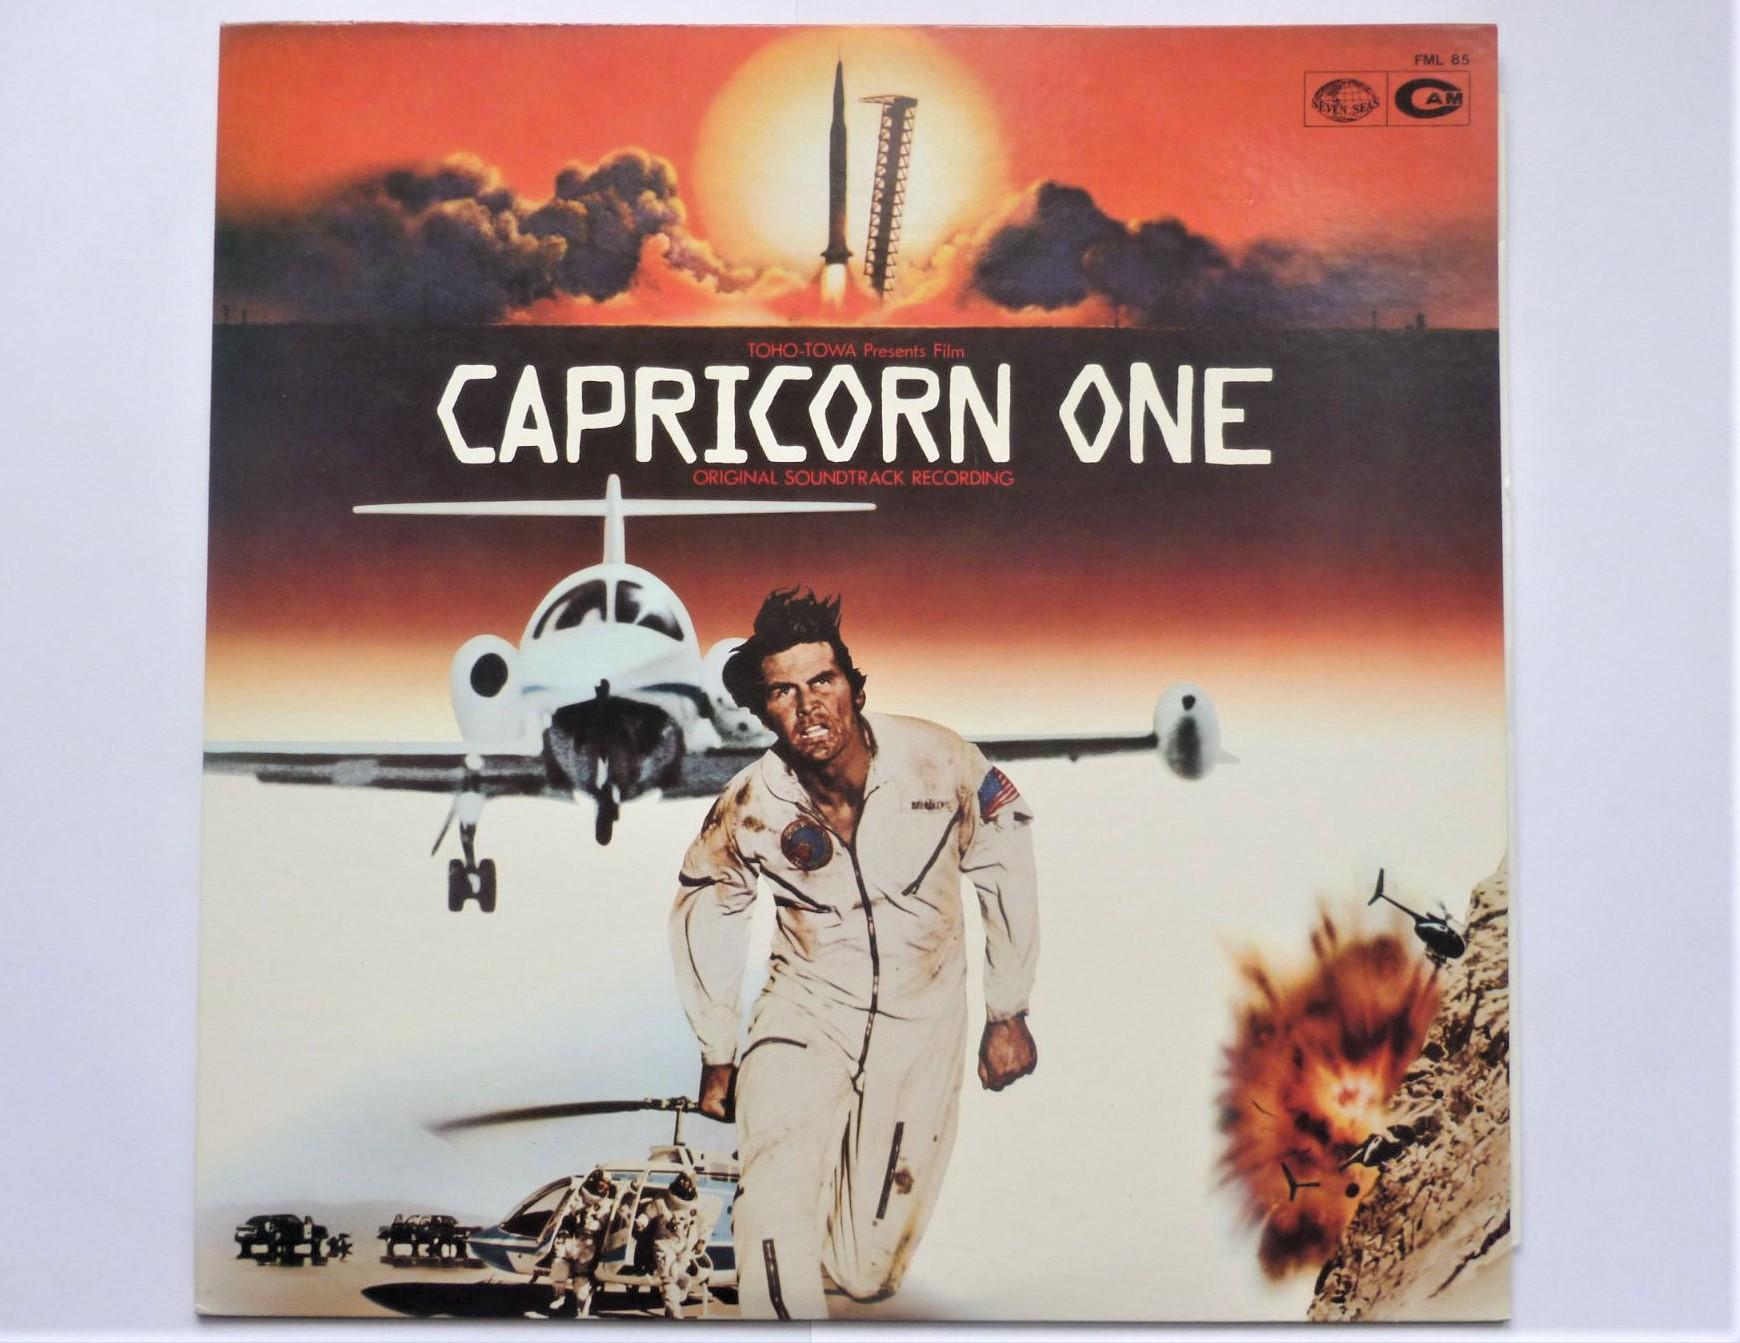 VARIOUS - Capricorn One - LP